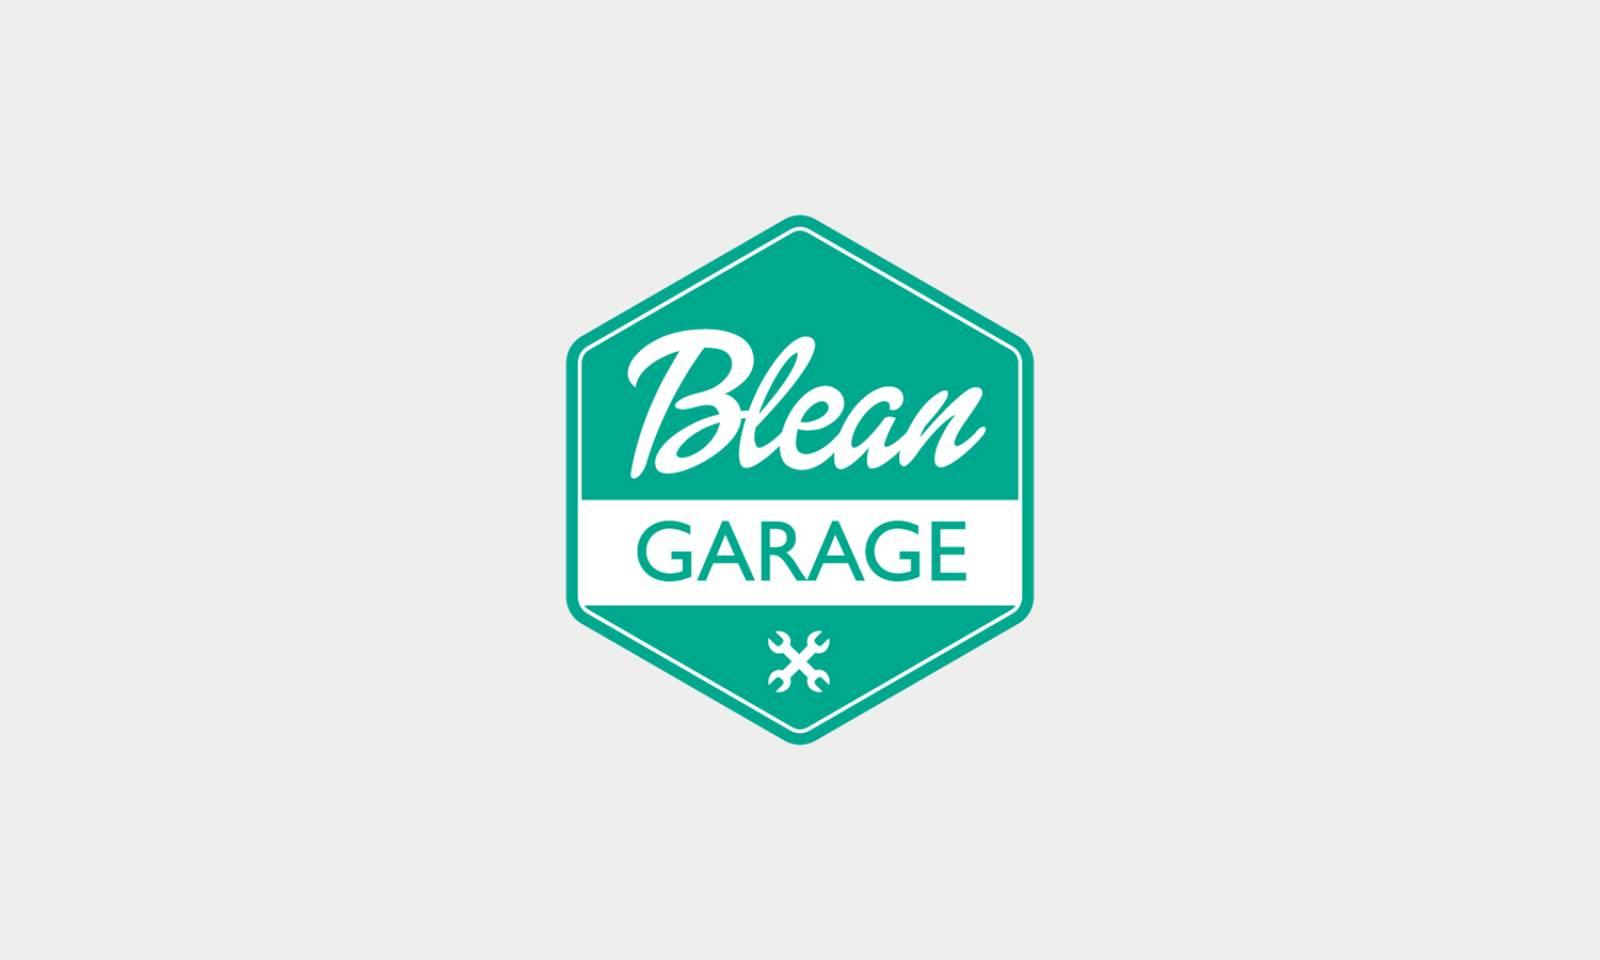 logo-Blean-corporate-identity-agency-graphic-design-canterbury.jpg